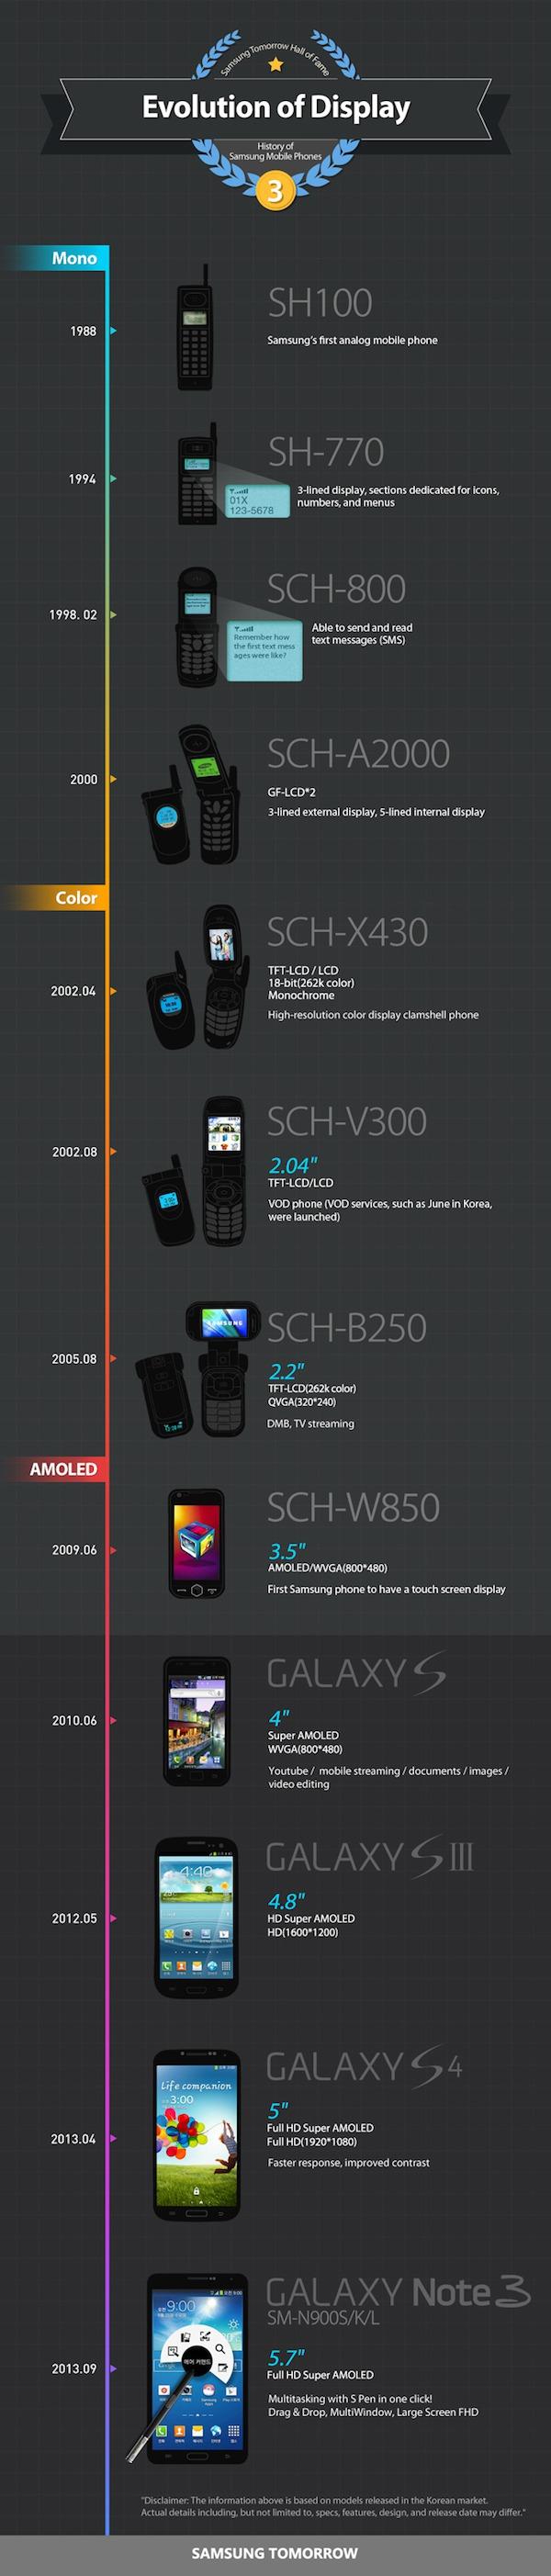 Evolution-of-Displayhistory-of-samsung-mobile-phones_ENG